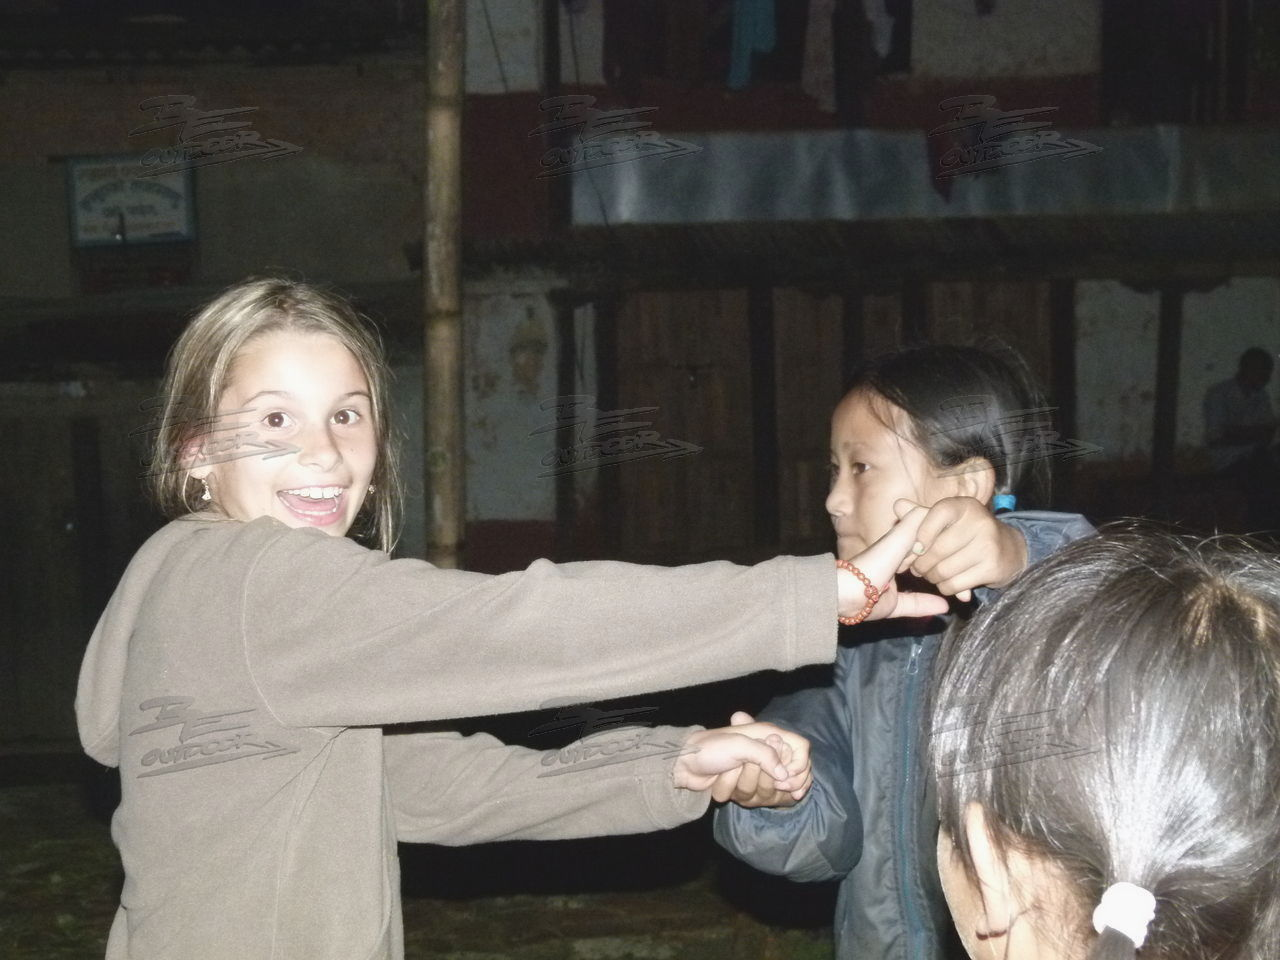 Be-outdoor.de - Tagebuch einer Tour durch Nepal - Tag 5: Ankunft in Chauki Bangan